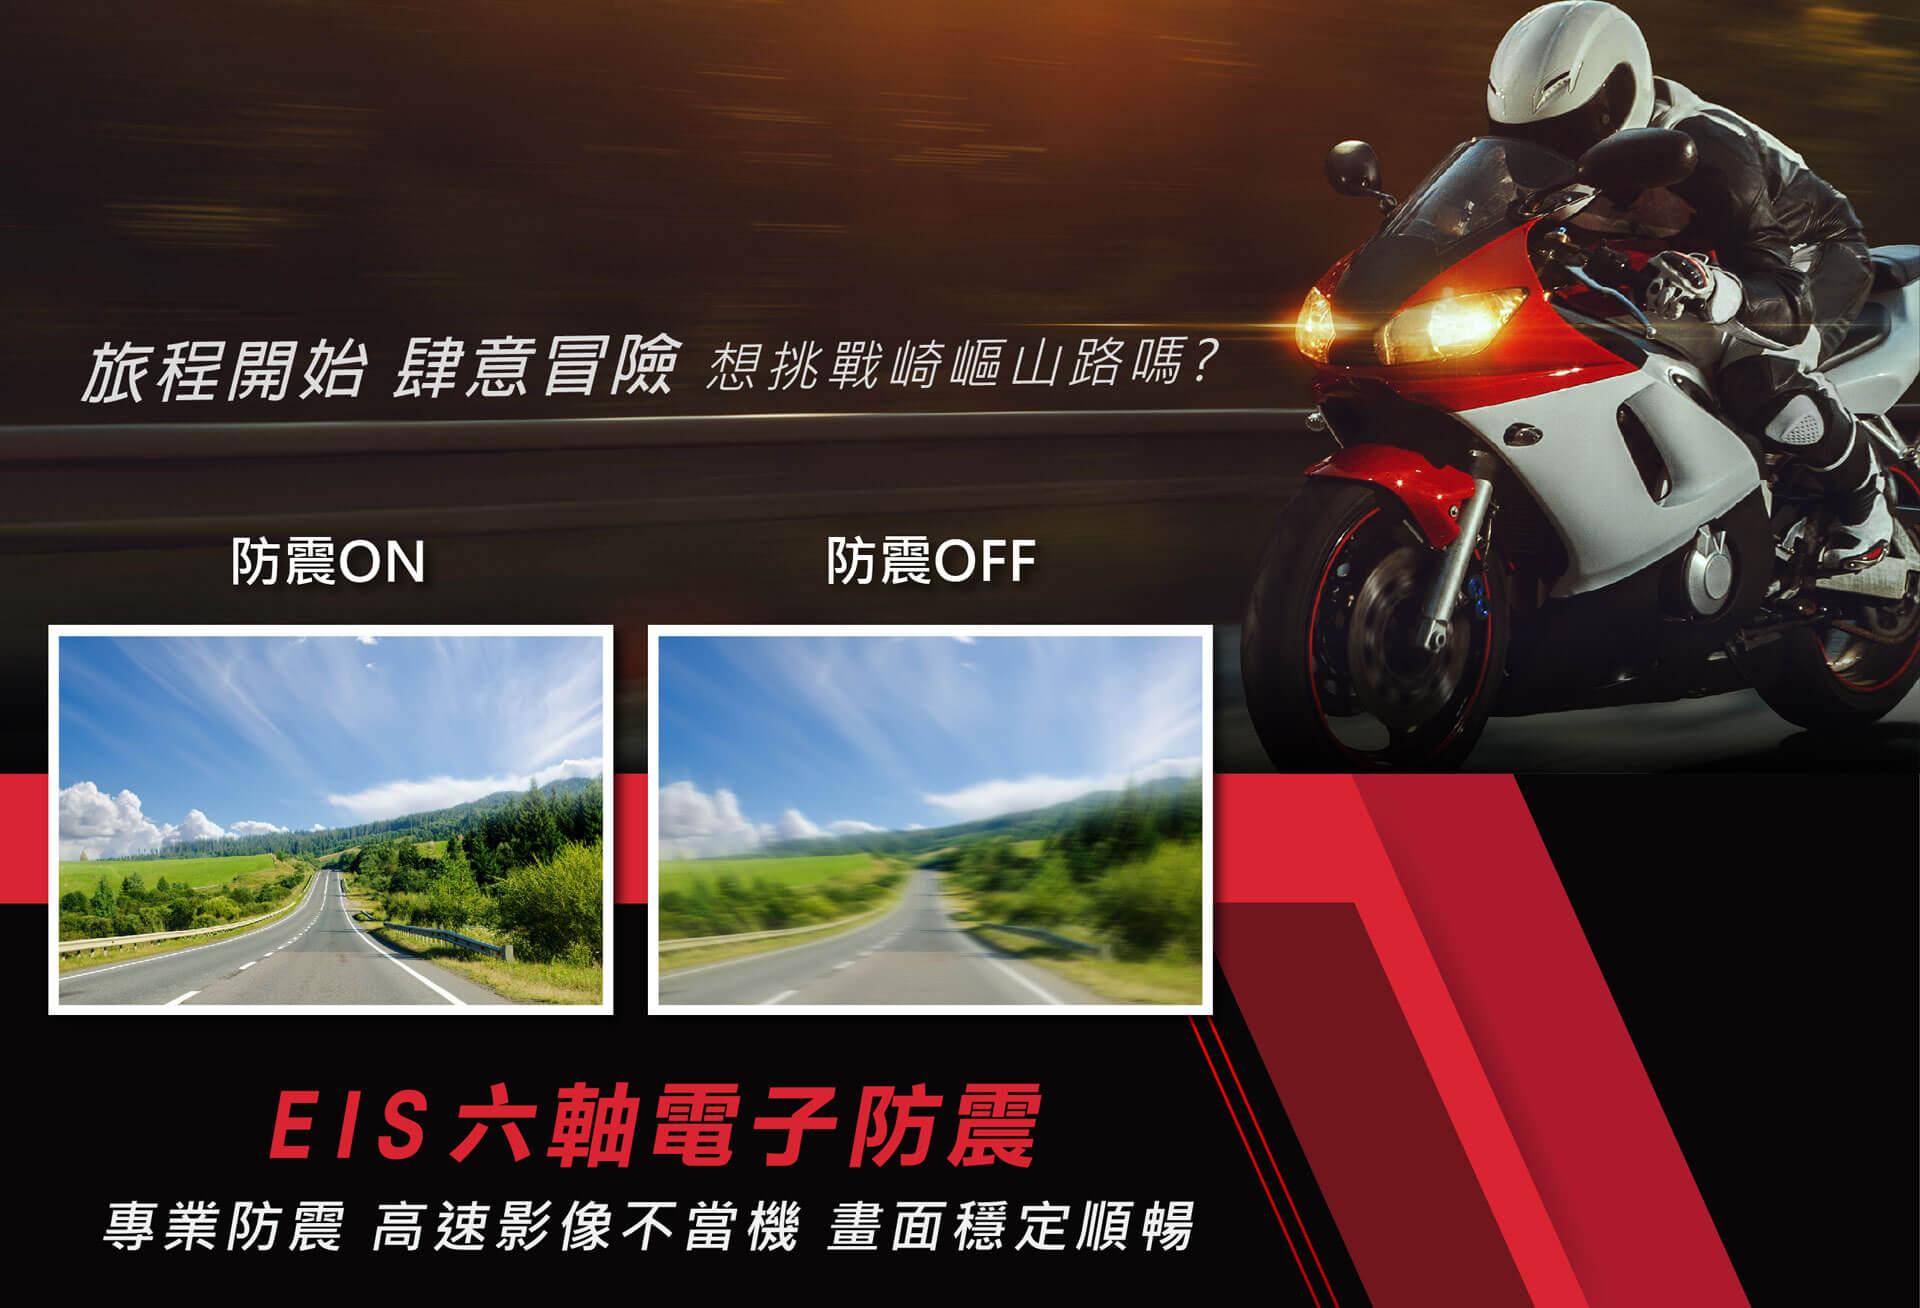 proimages/product/pro-01/pro-01-002/B62/B62-12.jpg